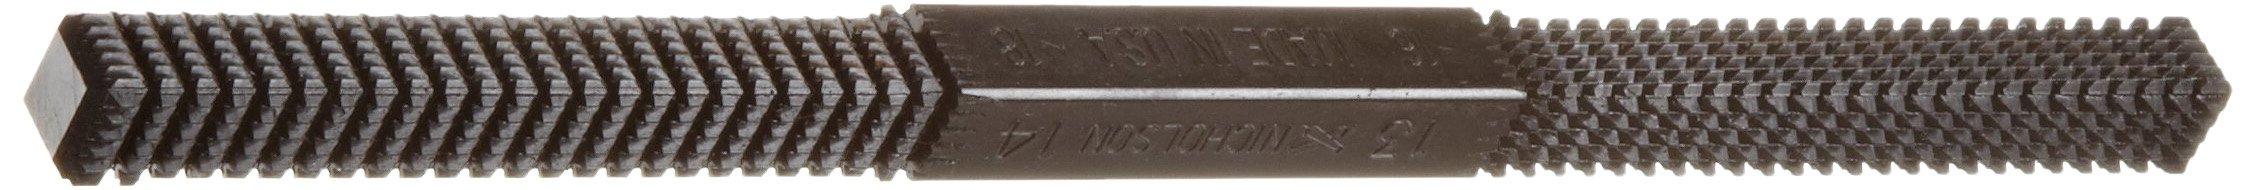 Nicholson Hand File, Thread Restoring, Thread Teeth, Square, Regular Bolt, 6'' Length